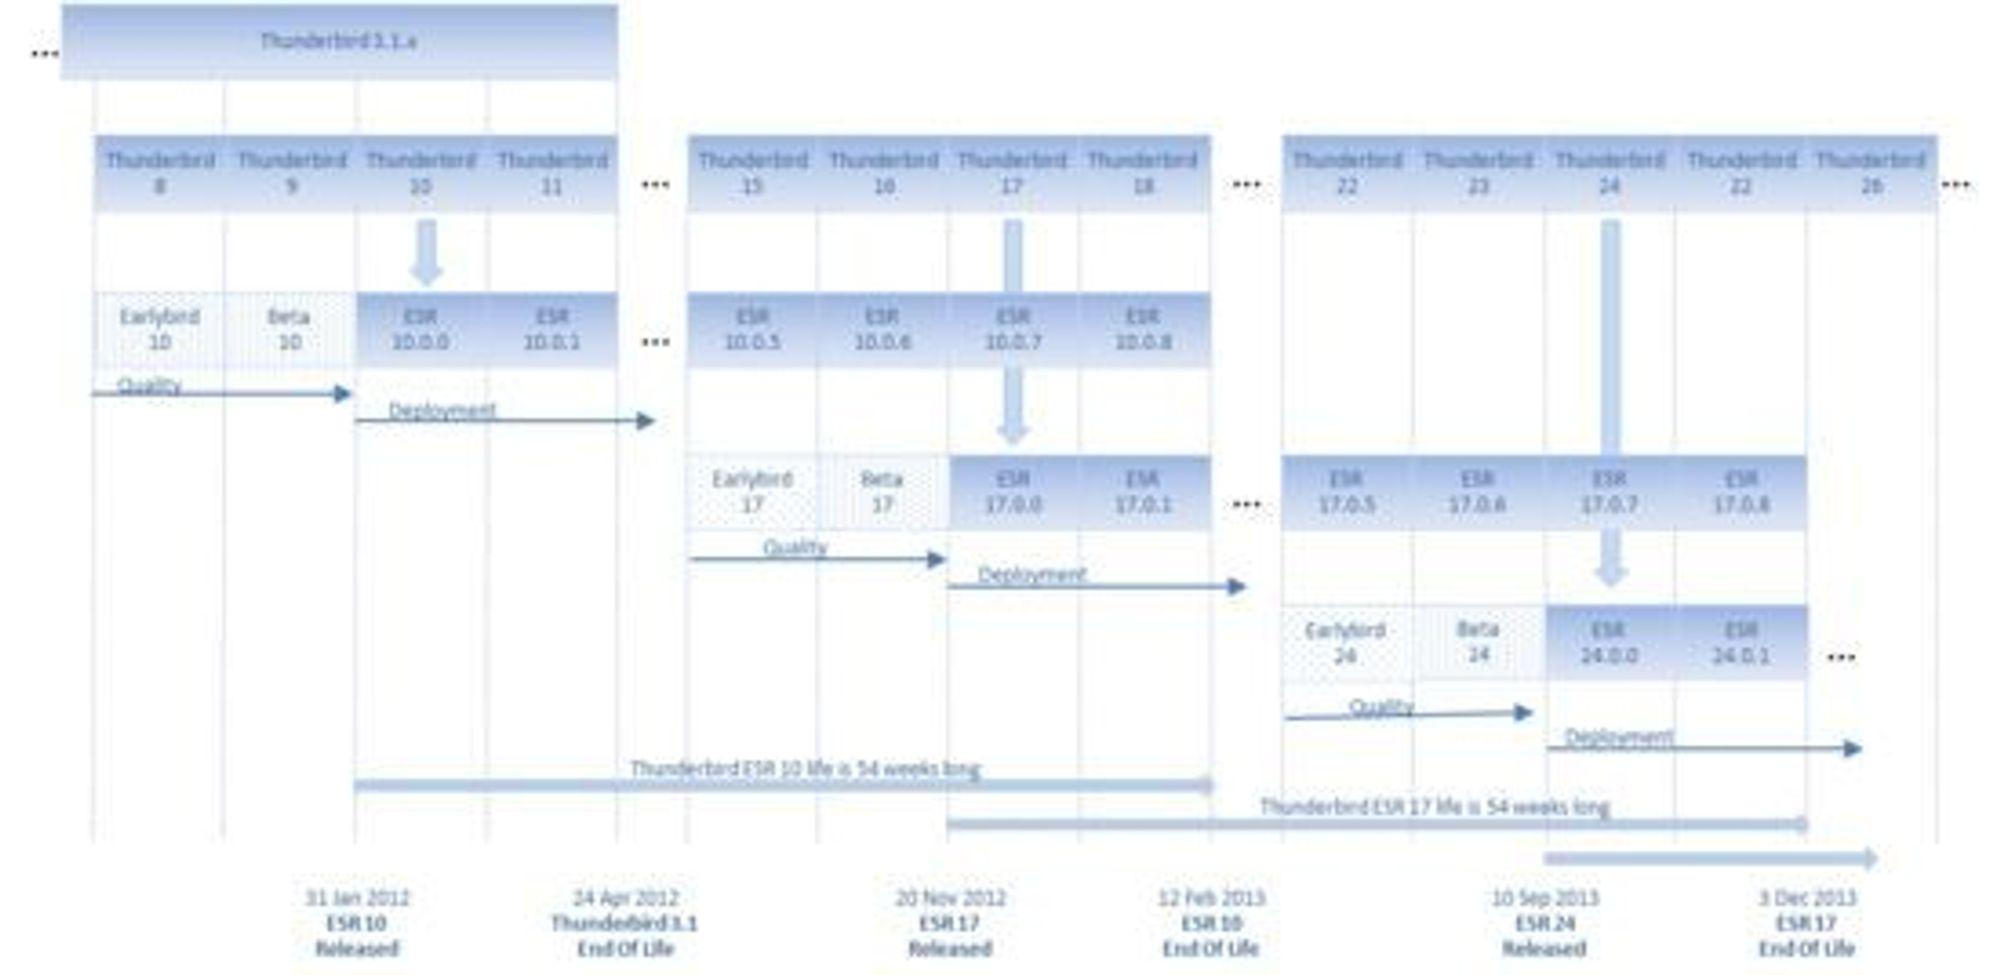 Tidsplan for utgivelser av Thunderbird ESR.